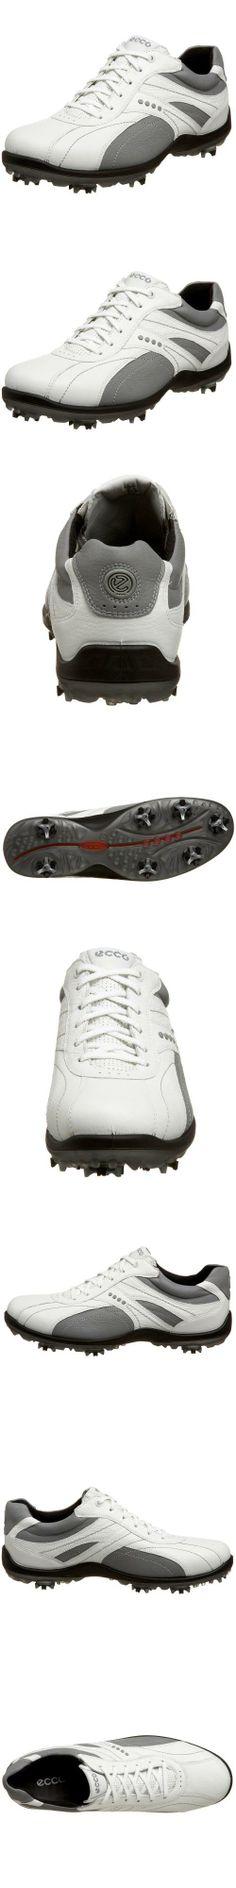 5cc63aeb612079 ECCO Men s Casual Cool Premier Golf Shoe